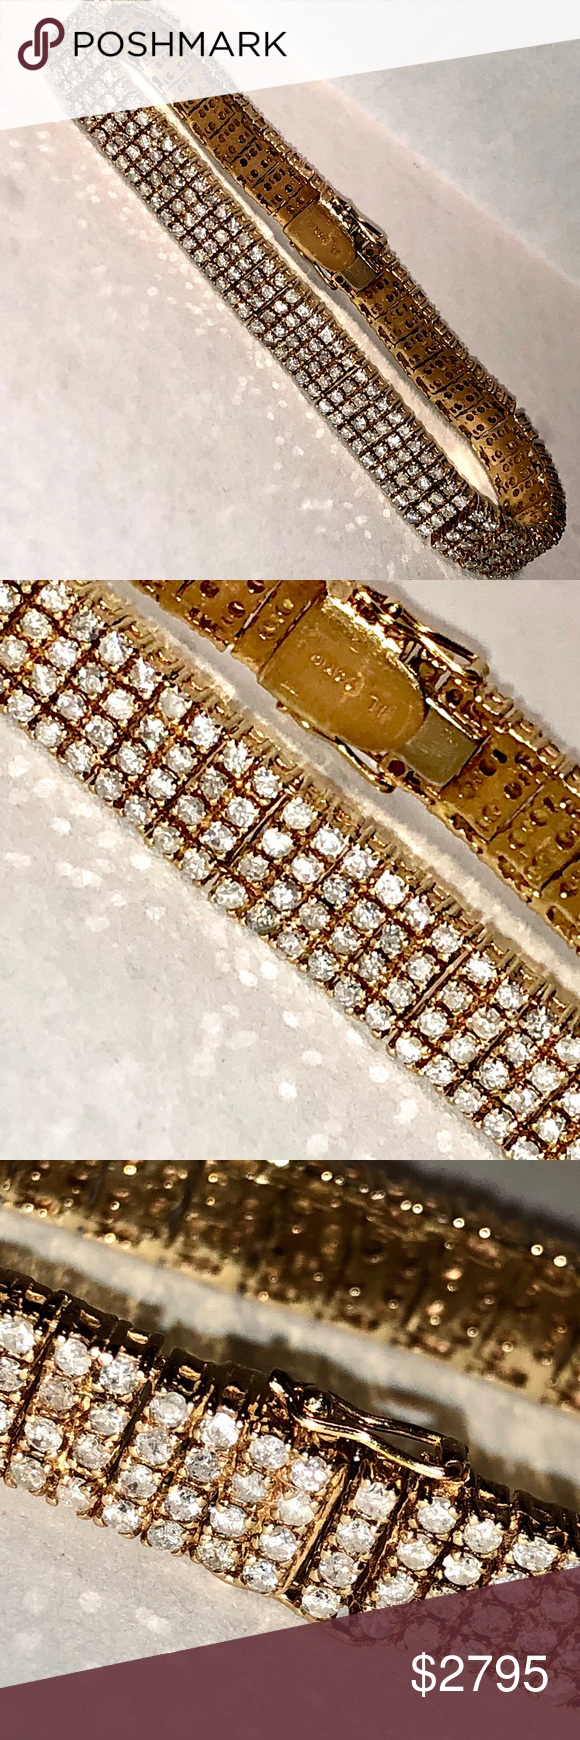 K gold tcw si h diamonds tennis bracelet estate k rose